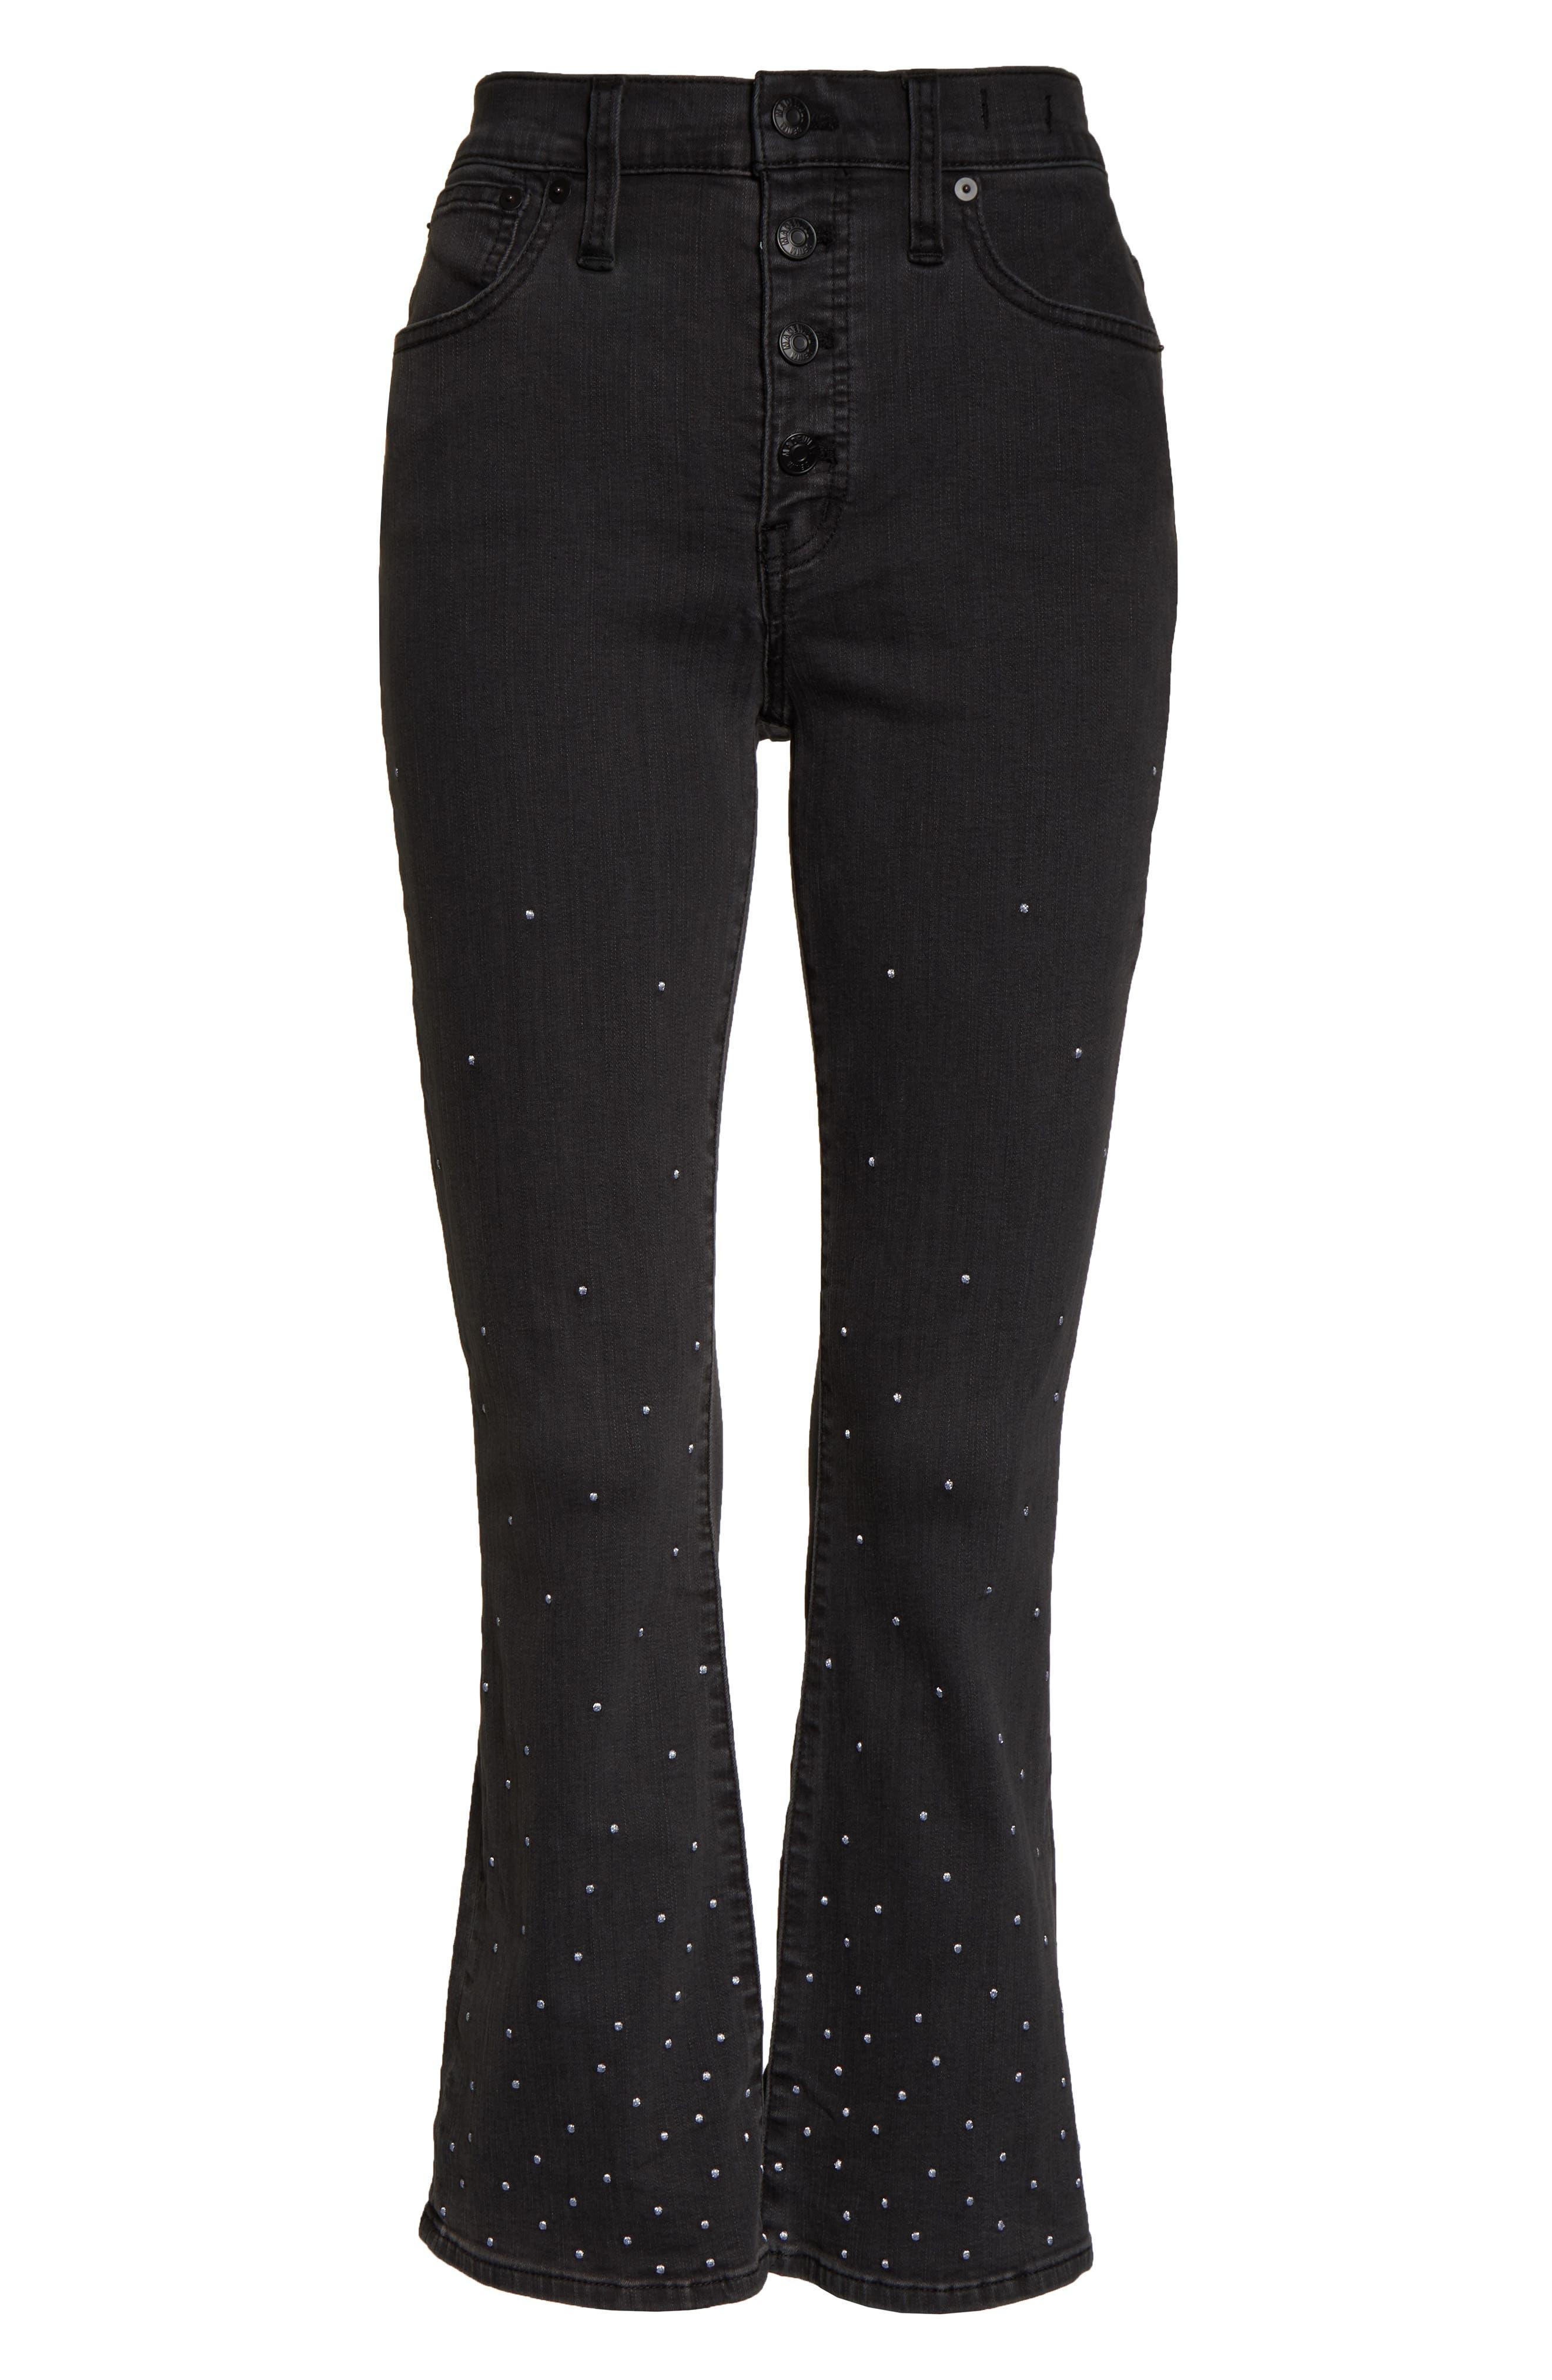 Cali Demi Boot Jeans,                             Alternate thumbnail 4, color,                             SILVER DOTS